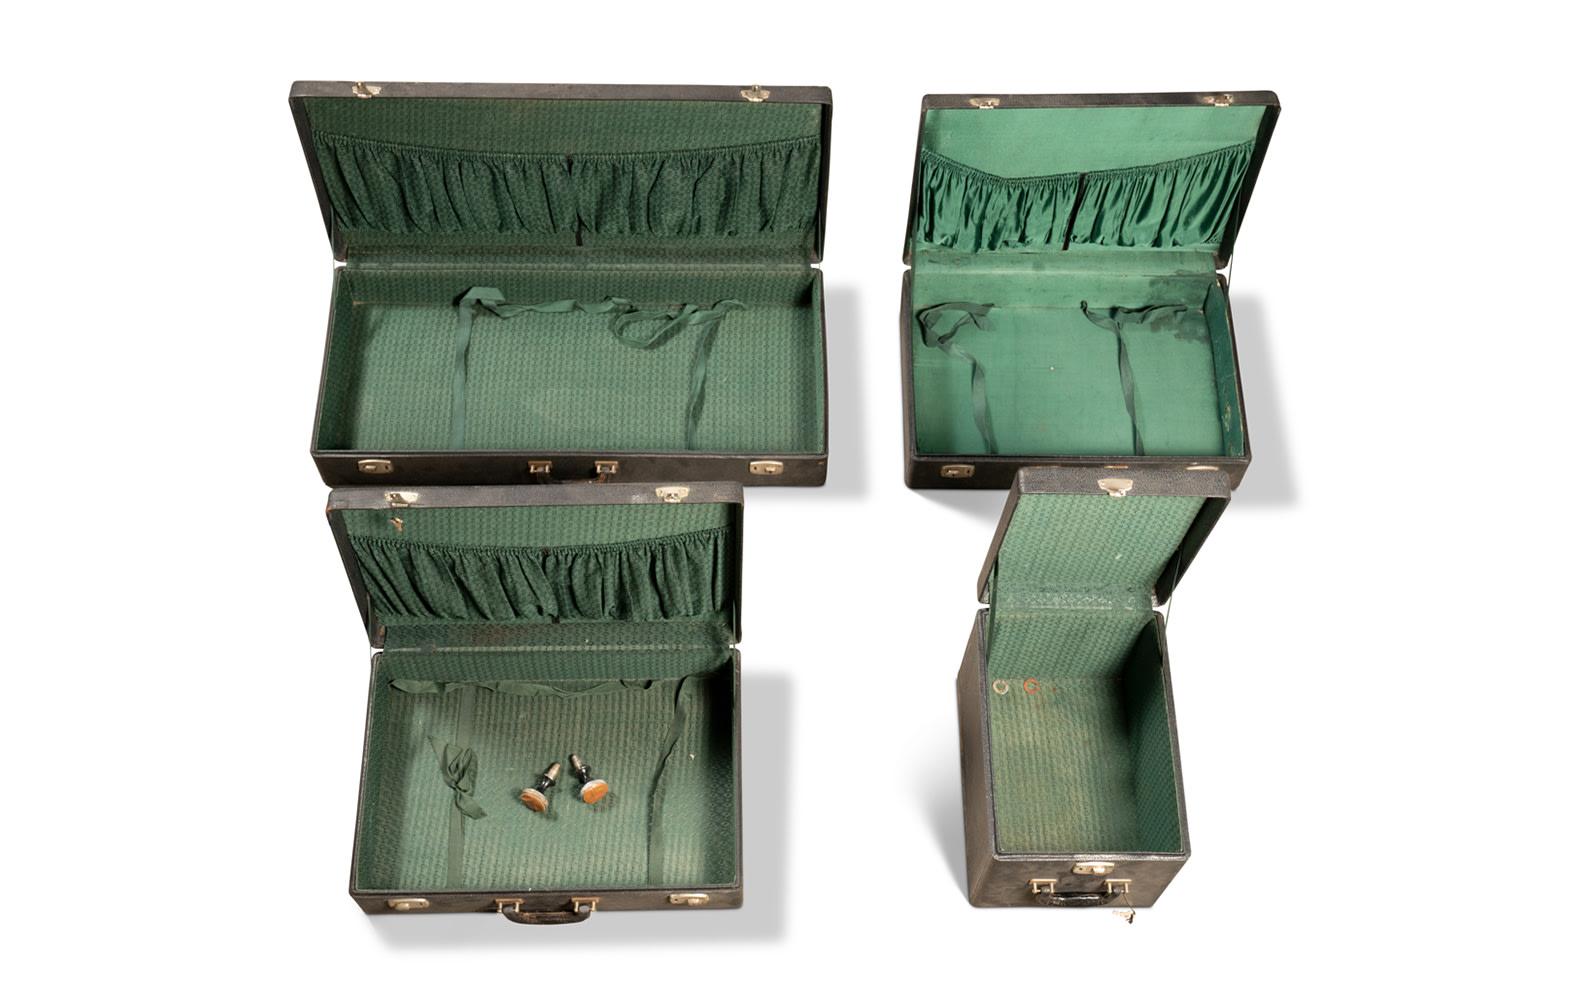 Four-Piece Motoring Luggage Set, c. 1920s